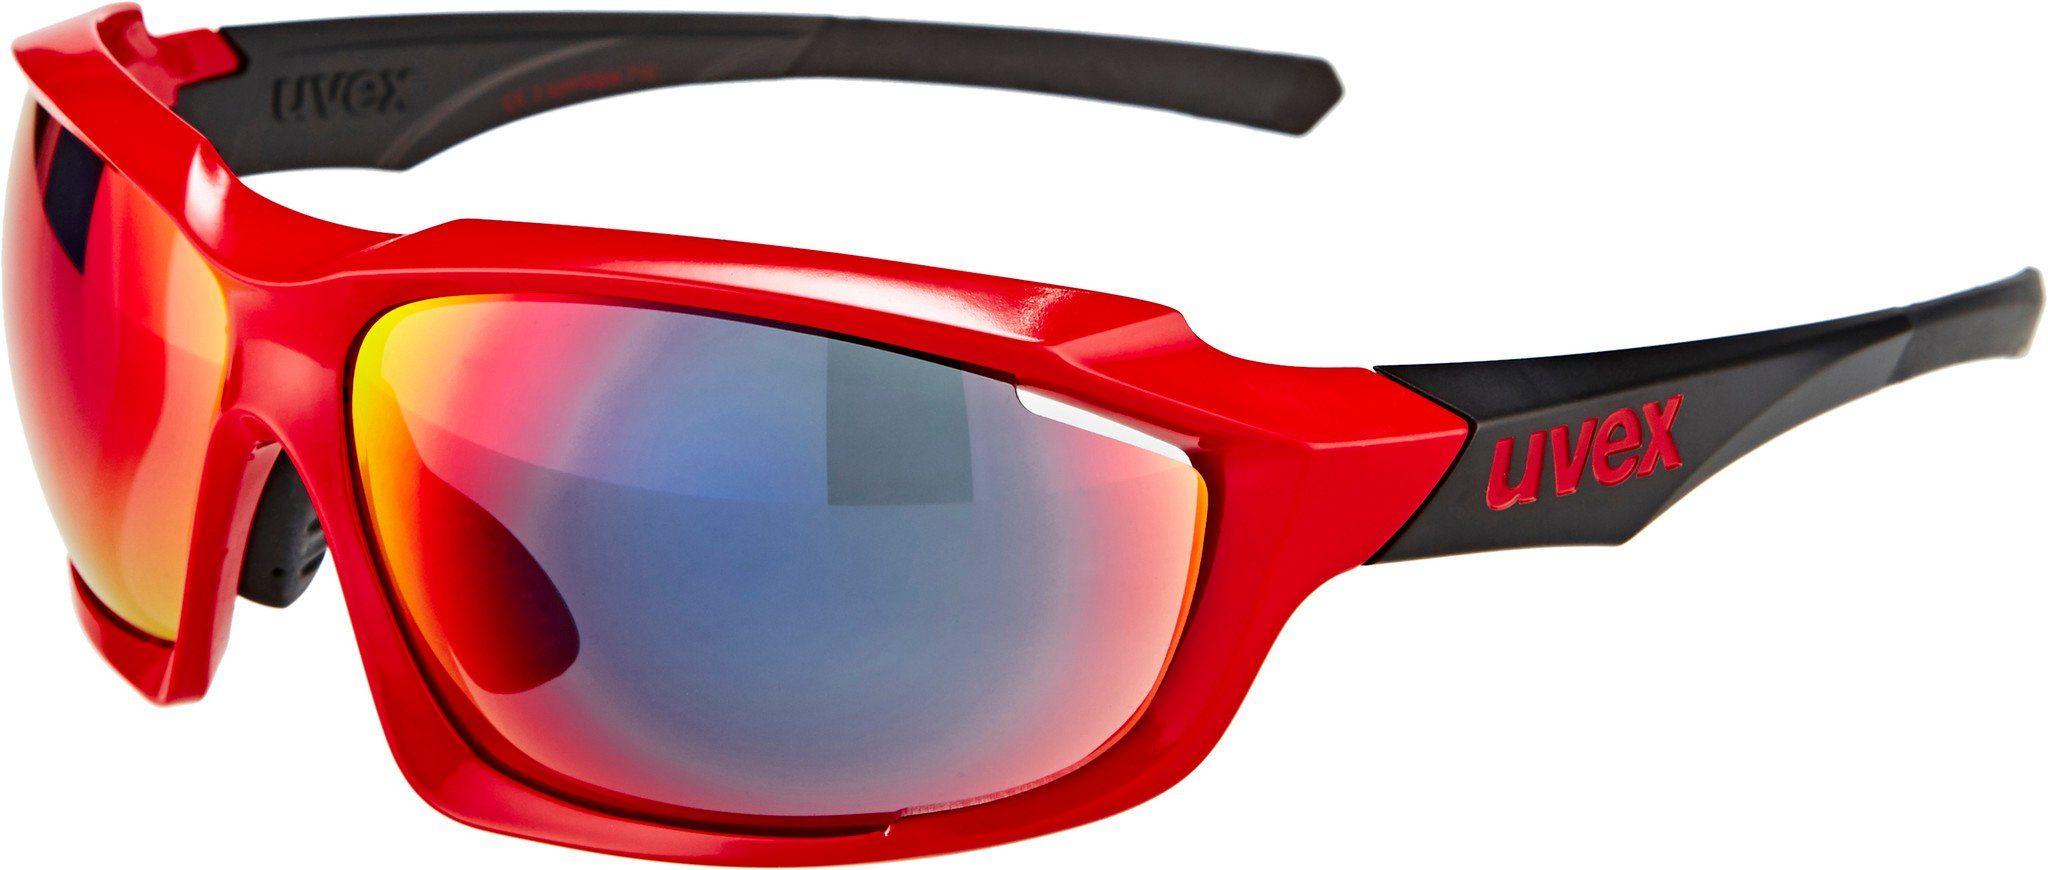 Uvex Sportbrille »sportstyle 710 Glasses«